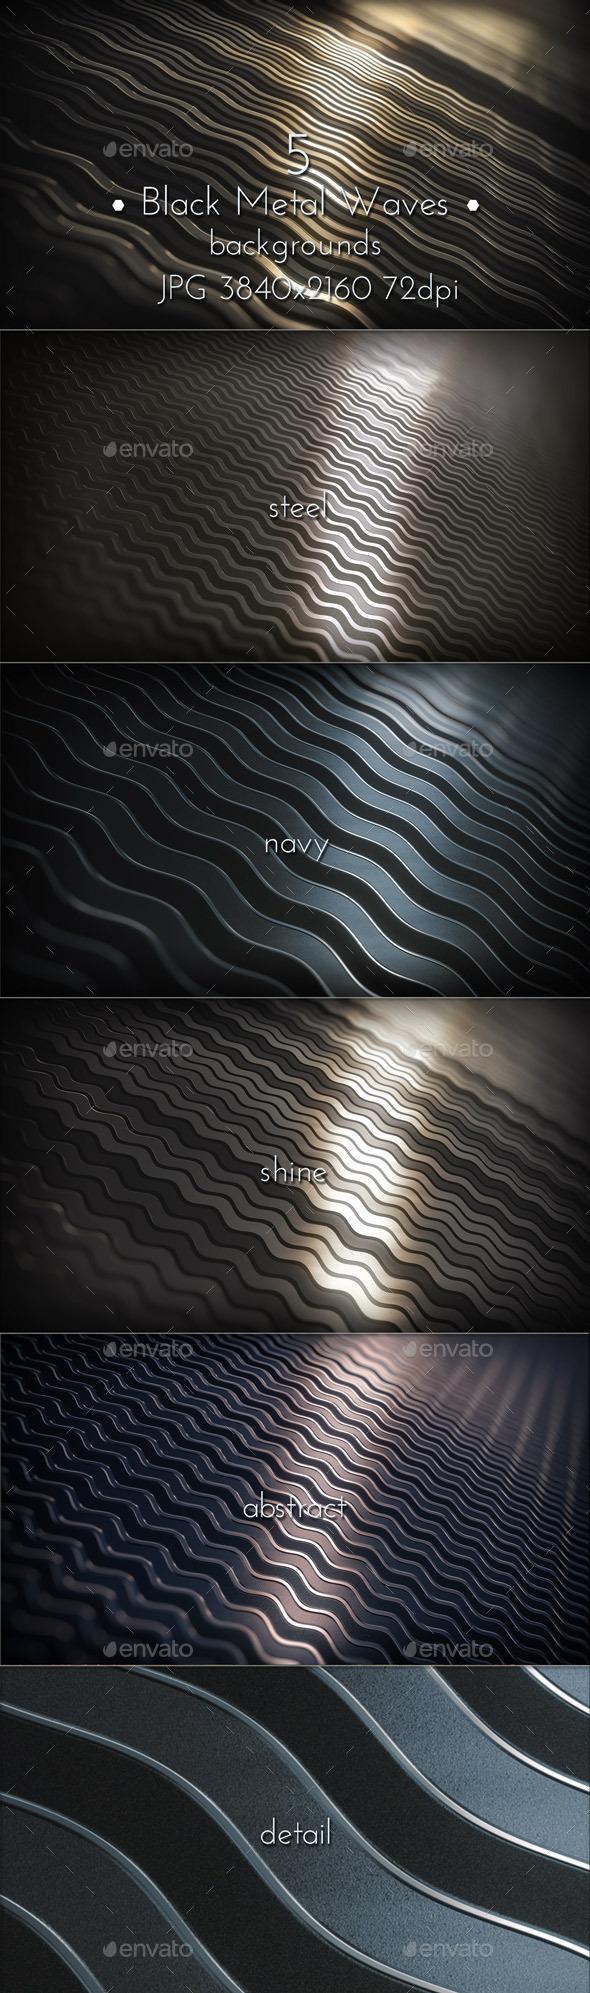 Black Metal Waves Pattern - Patterns Backgrounds